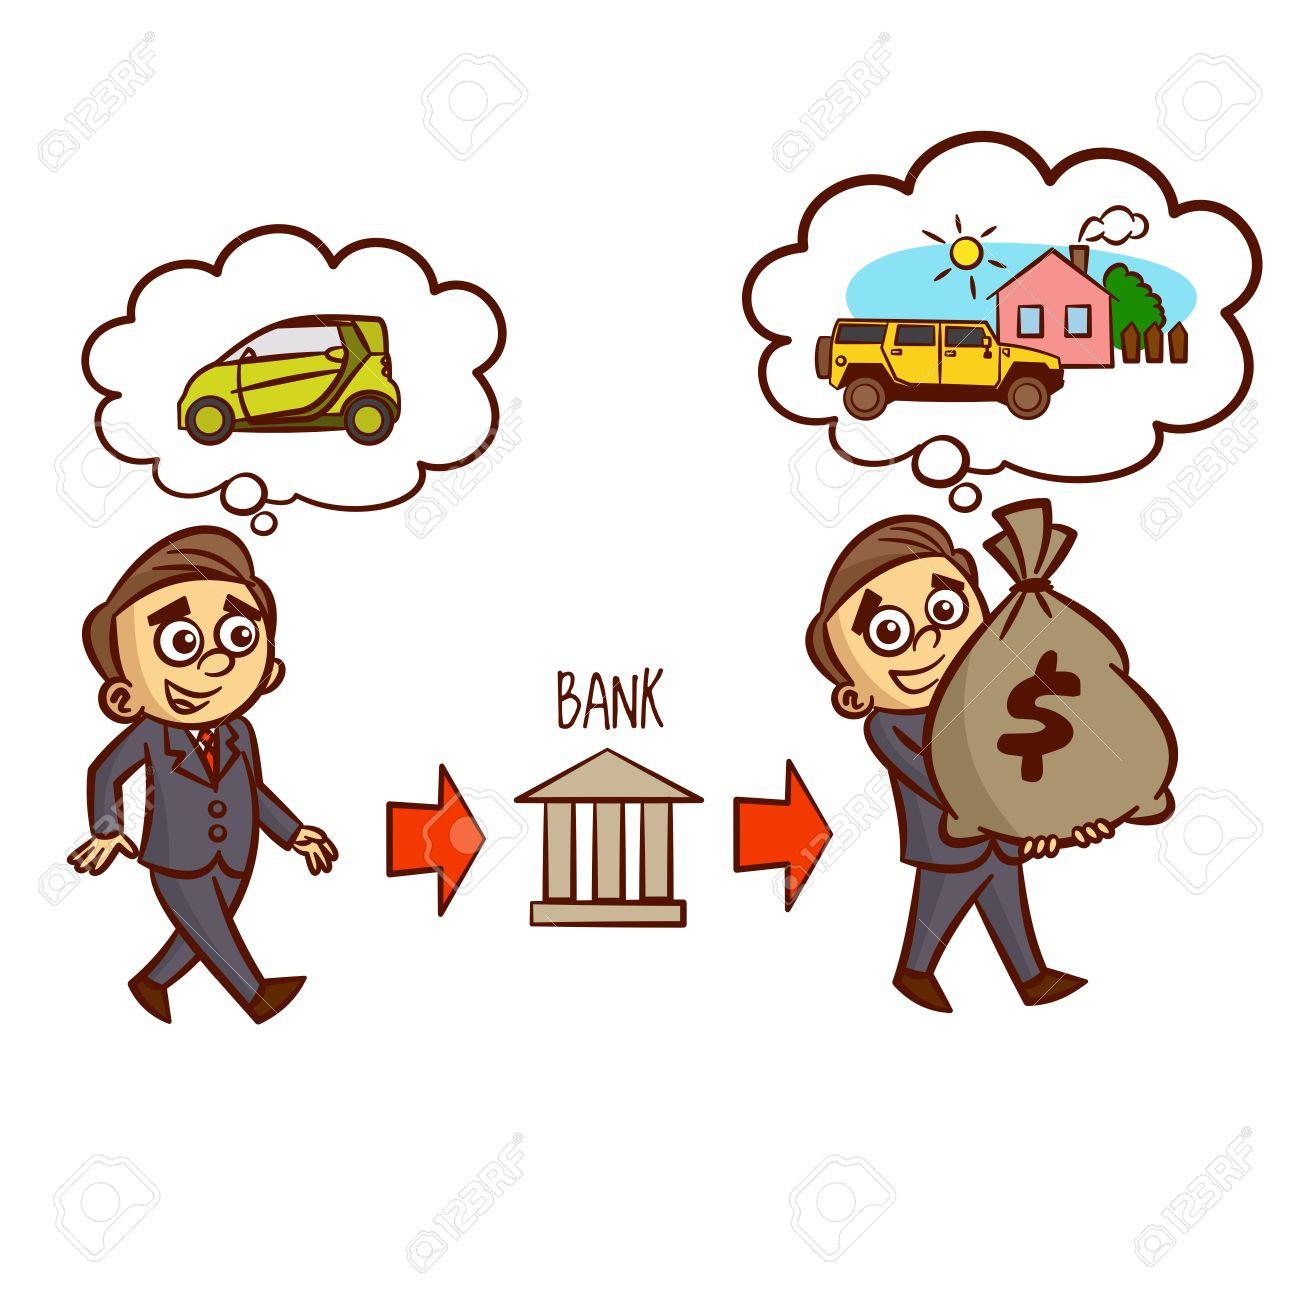 businessman gets a bank loan on the car mortgage clipart royalty rh 123rf com student loan clip art bank loan clipart